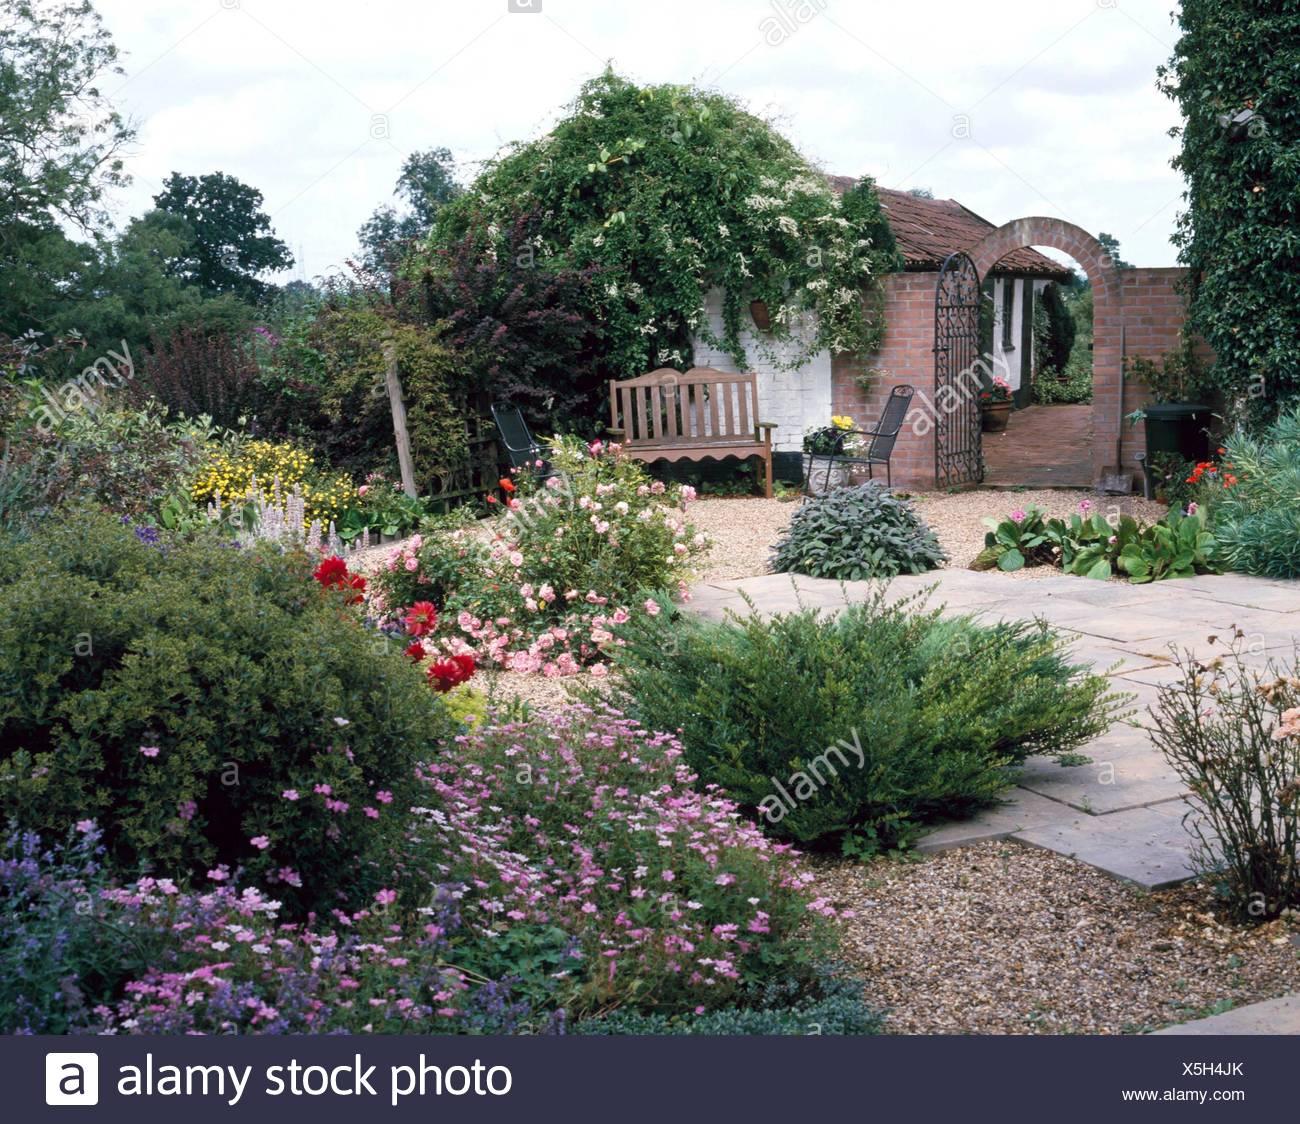 Garten Im Mediterranen Stil Med086385 Stockfoto Bild 278816011 Alamy